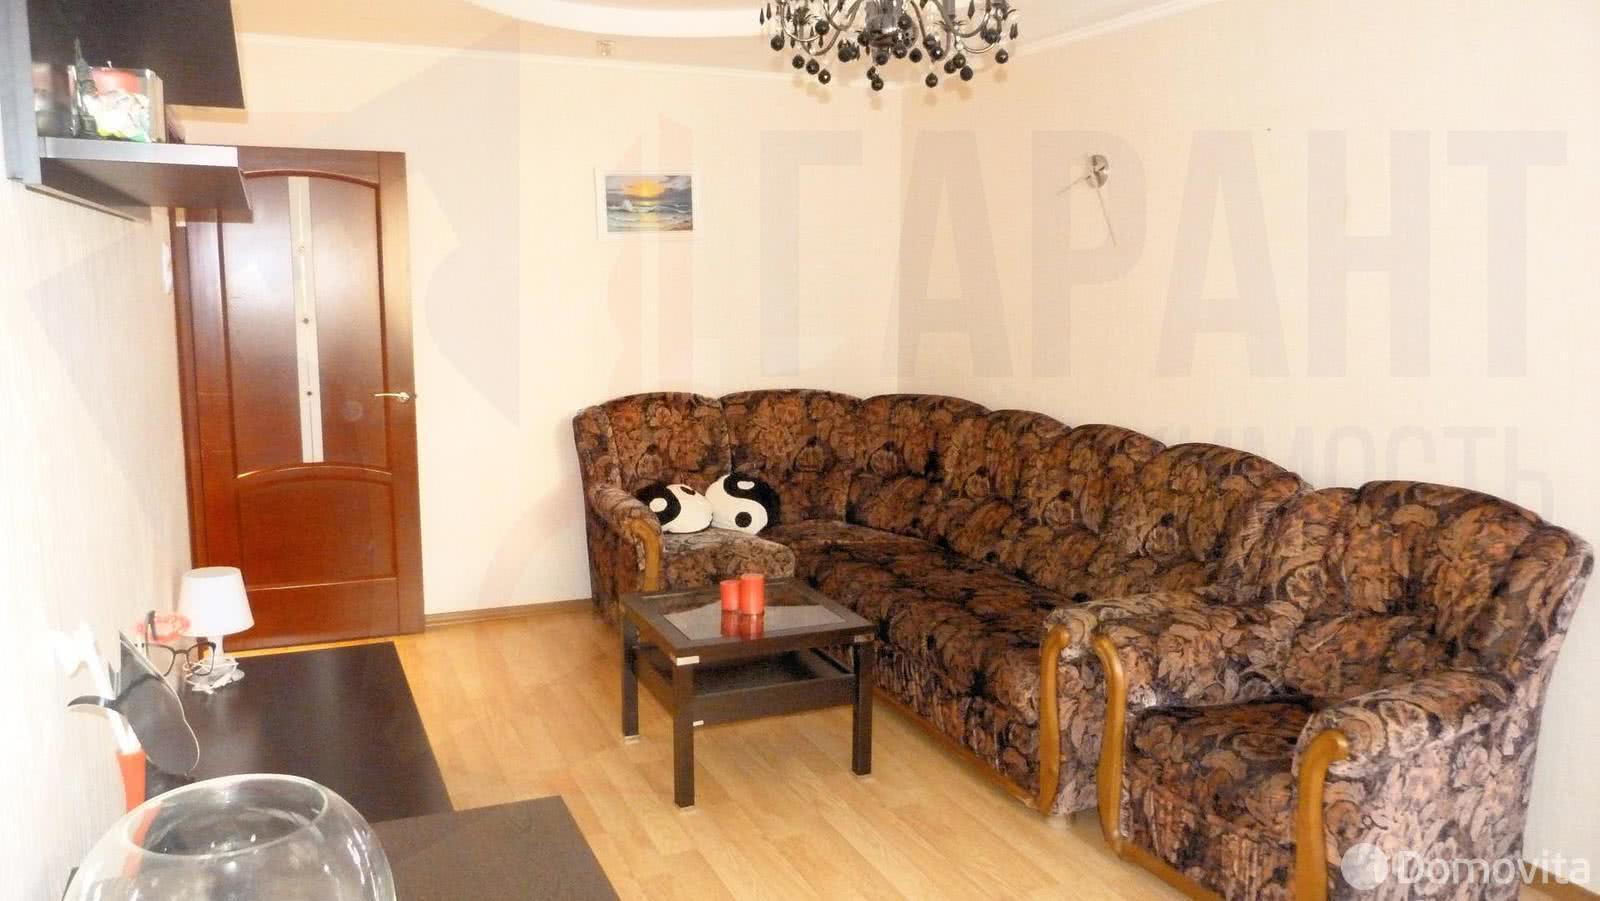 Снять 3-комнатную квартиру в Минске, ул. Левкова, д. 19 - фото 4